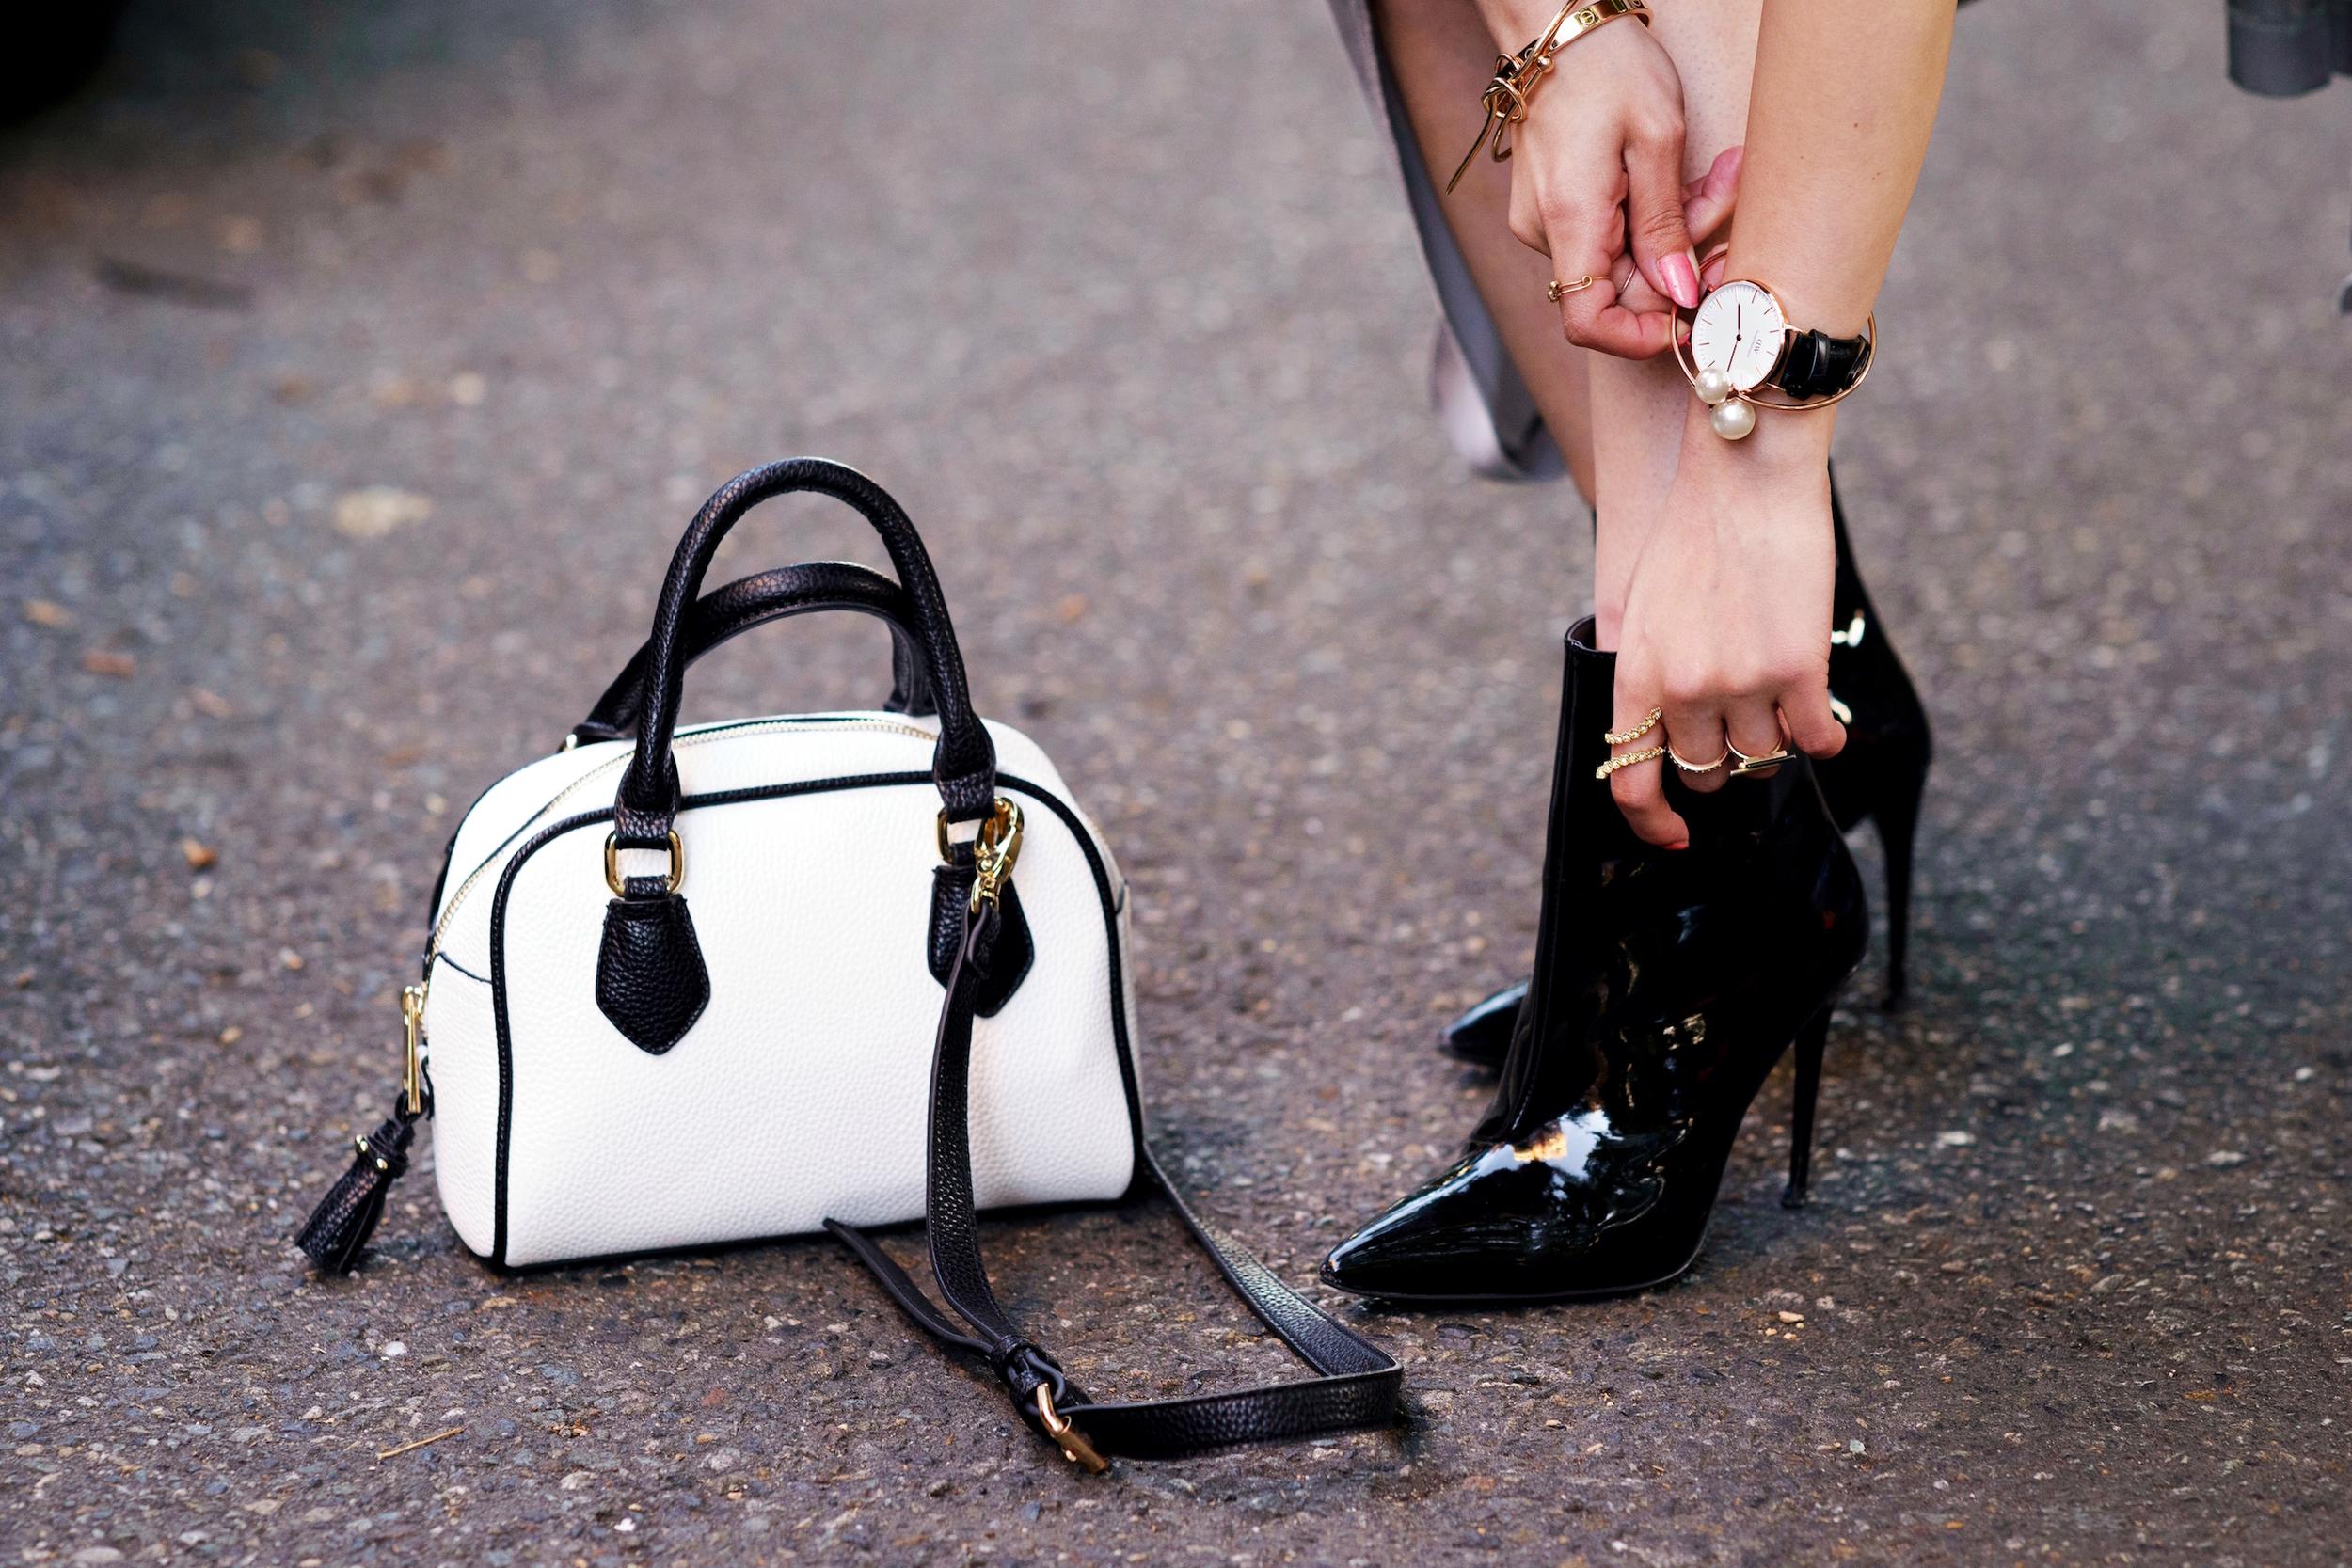 ALDO Patent Boots_ZARA Mini Bag_Suede Choker_Daniel Wellington Watch_Aikas Love Cloeset_Seattle Fashion Blogger from Japan_Lavender Hair_Messy low bun Hair